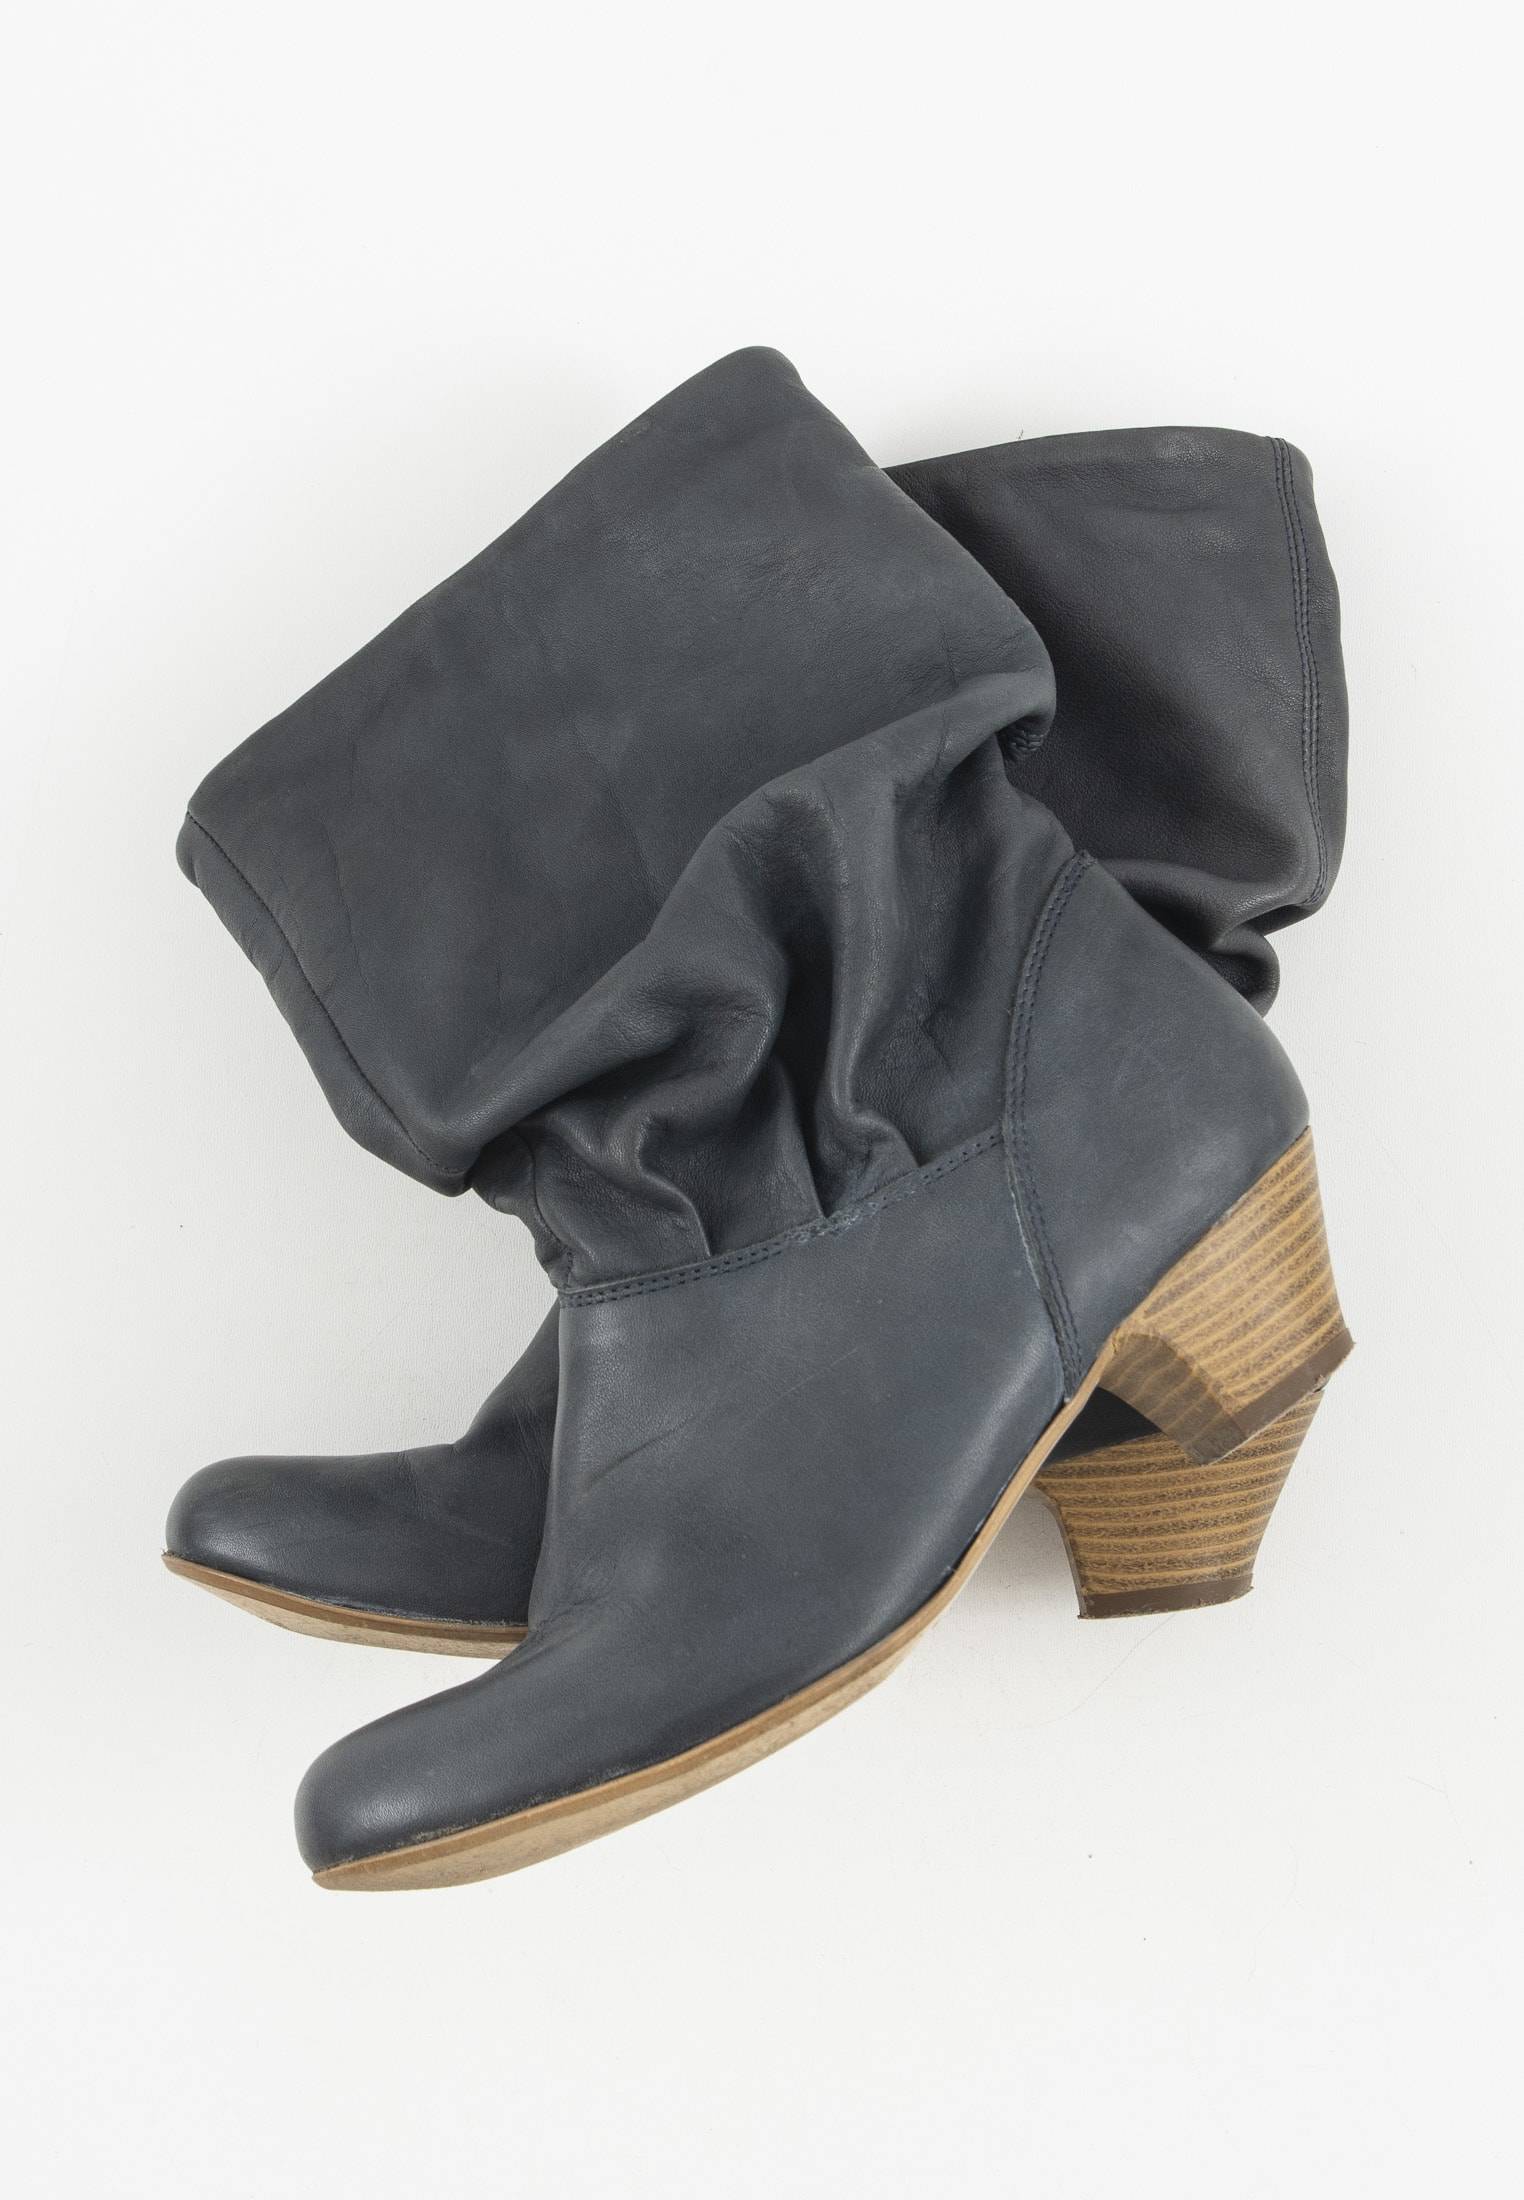 Akira Stiefel / Stiefelette / Boots Blau Gr.37